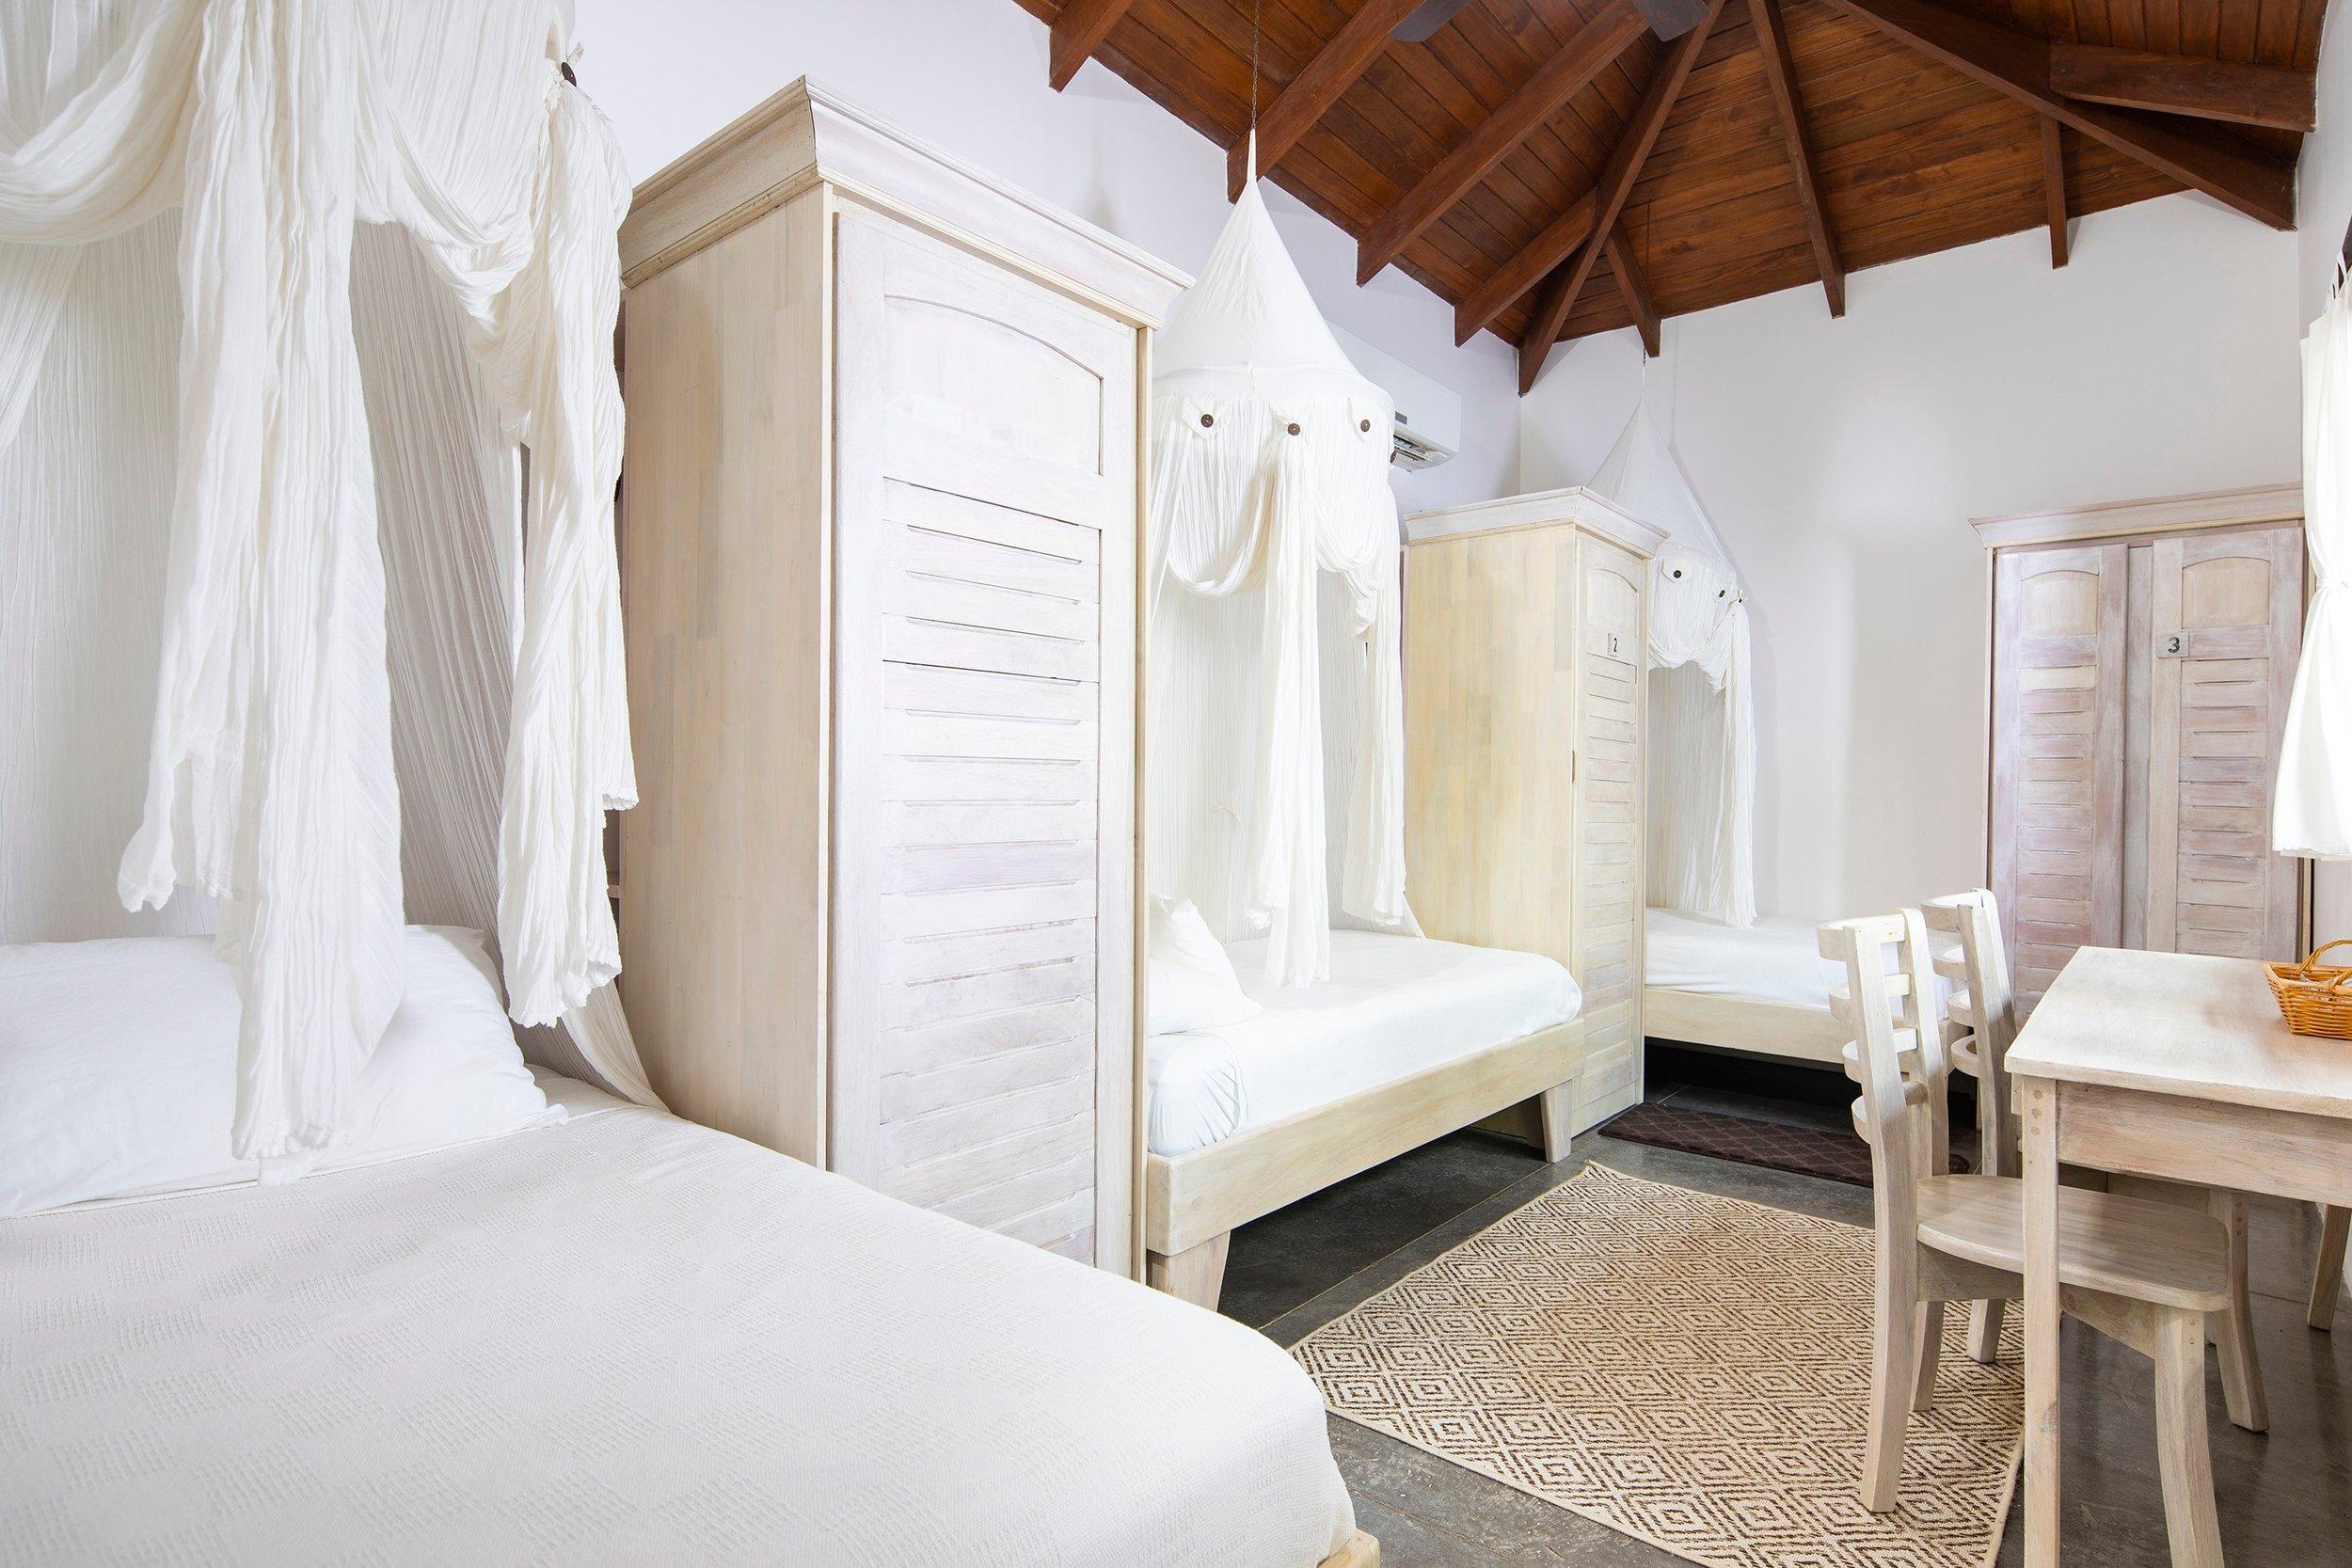 dorm room - $1,222.jpg